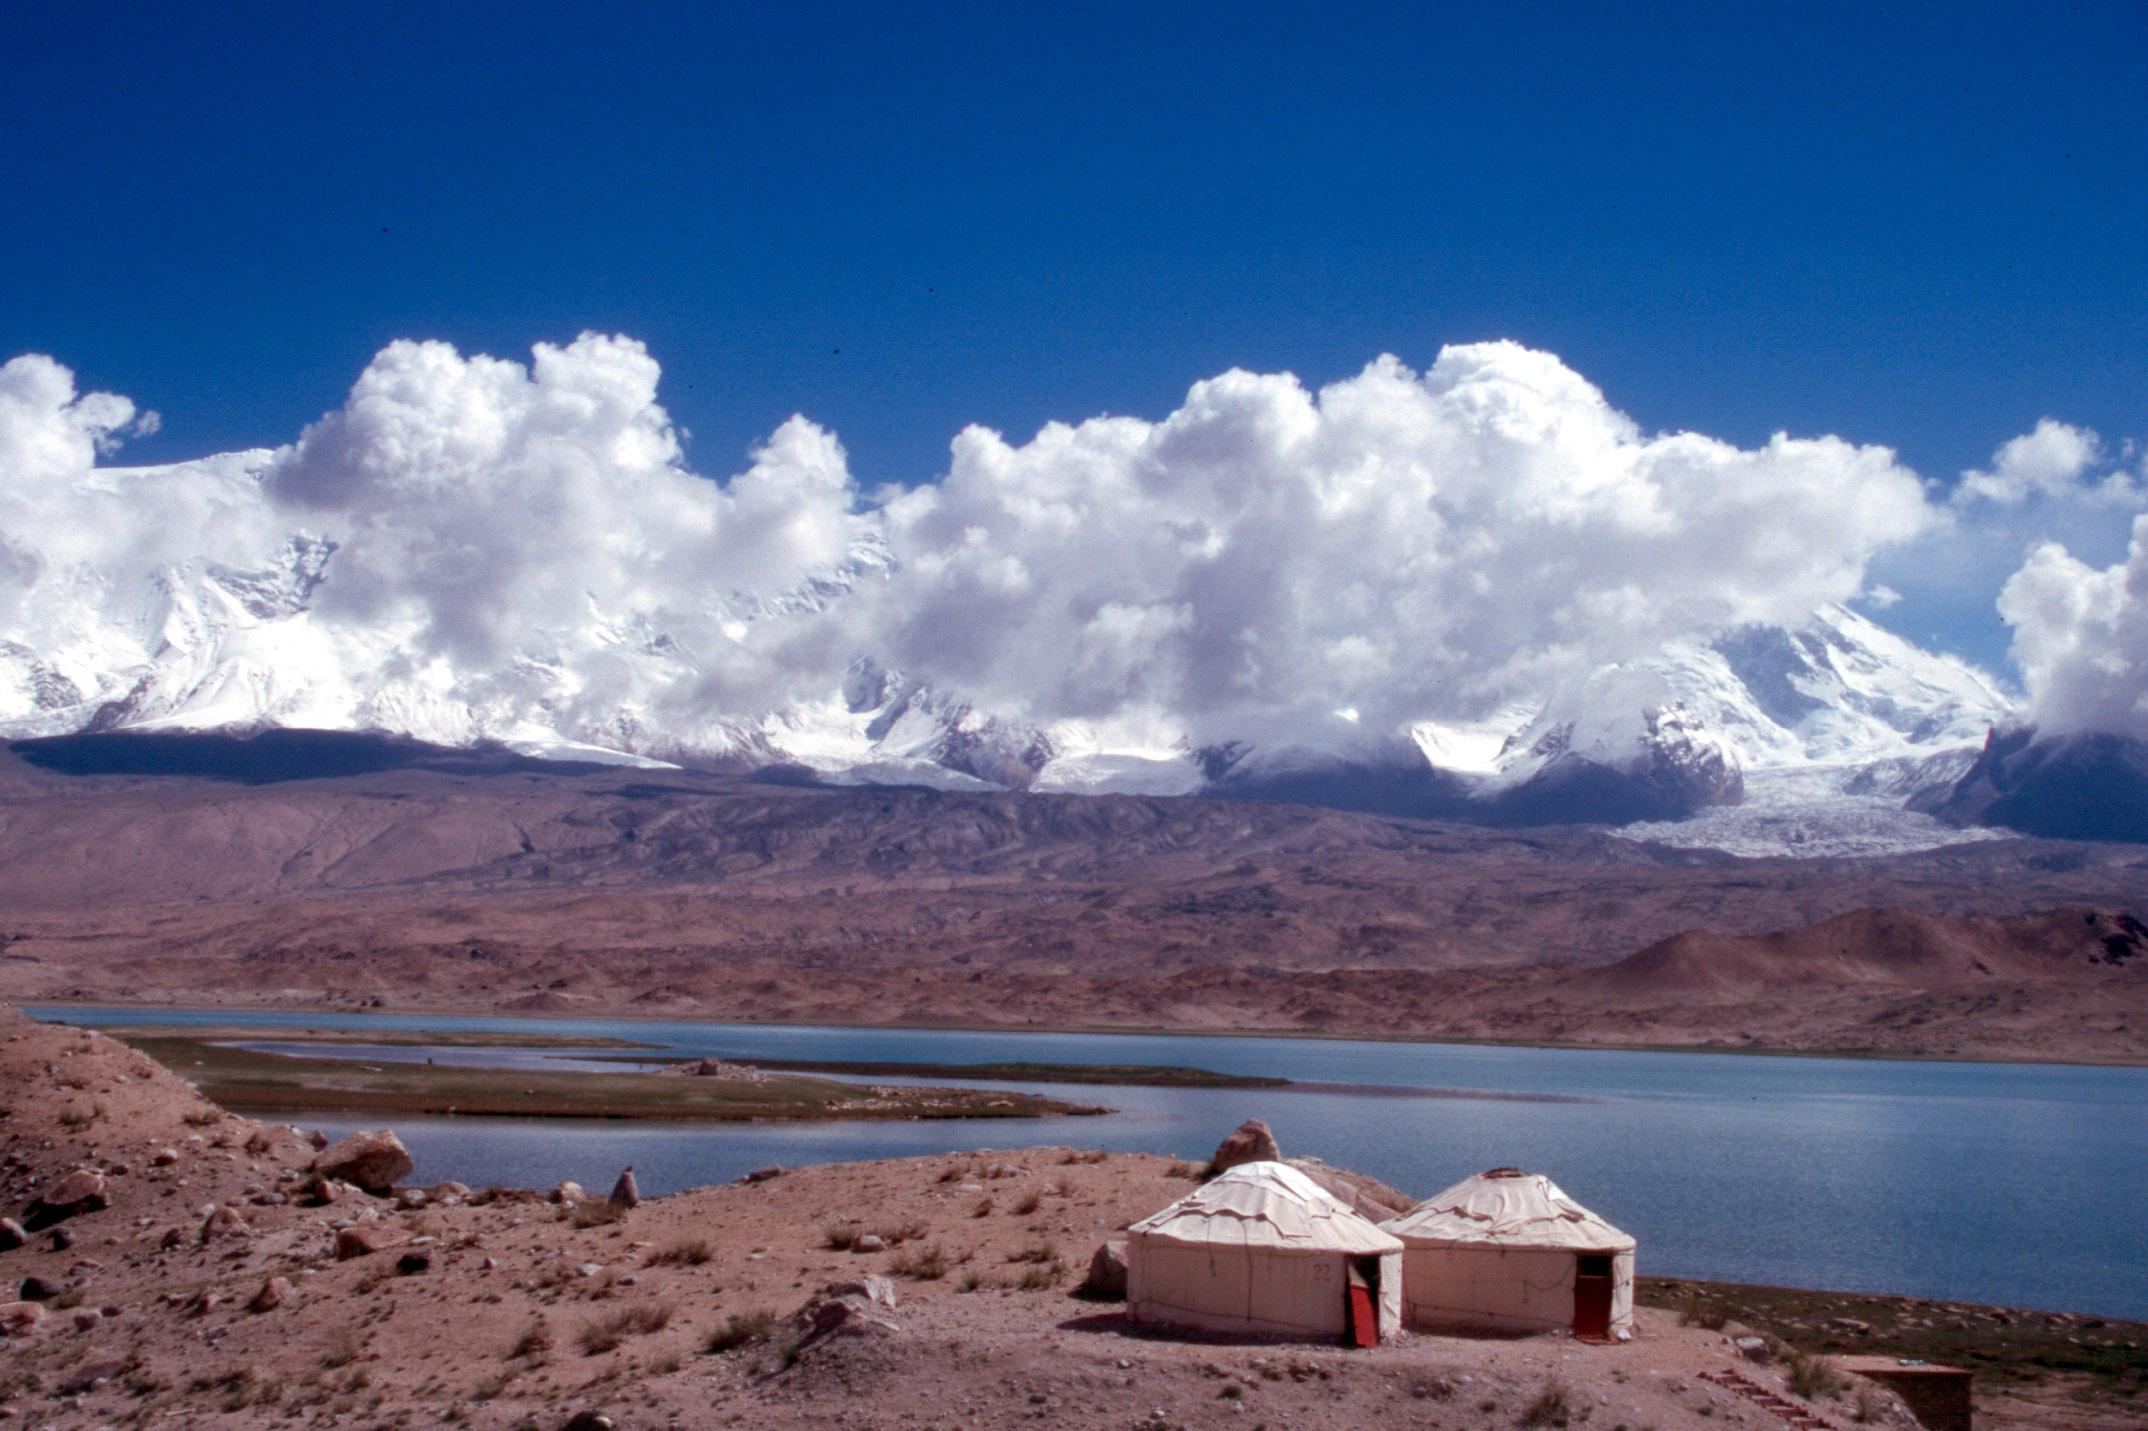 World Trip Part 3 From Tashkurgan To Turpan